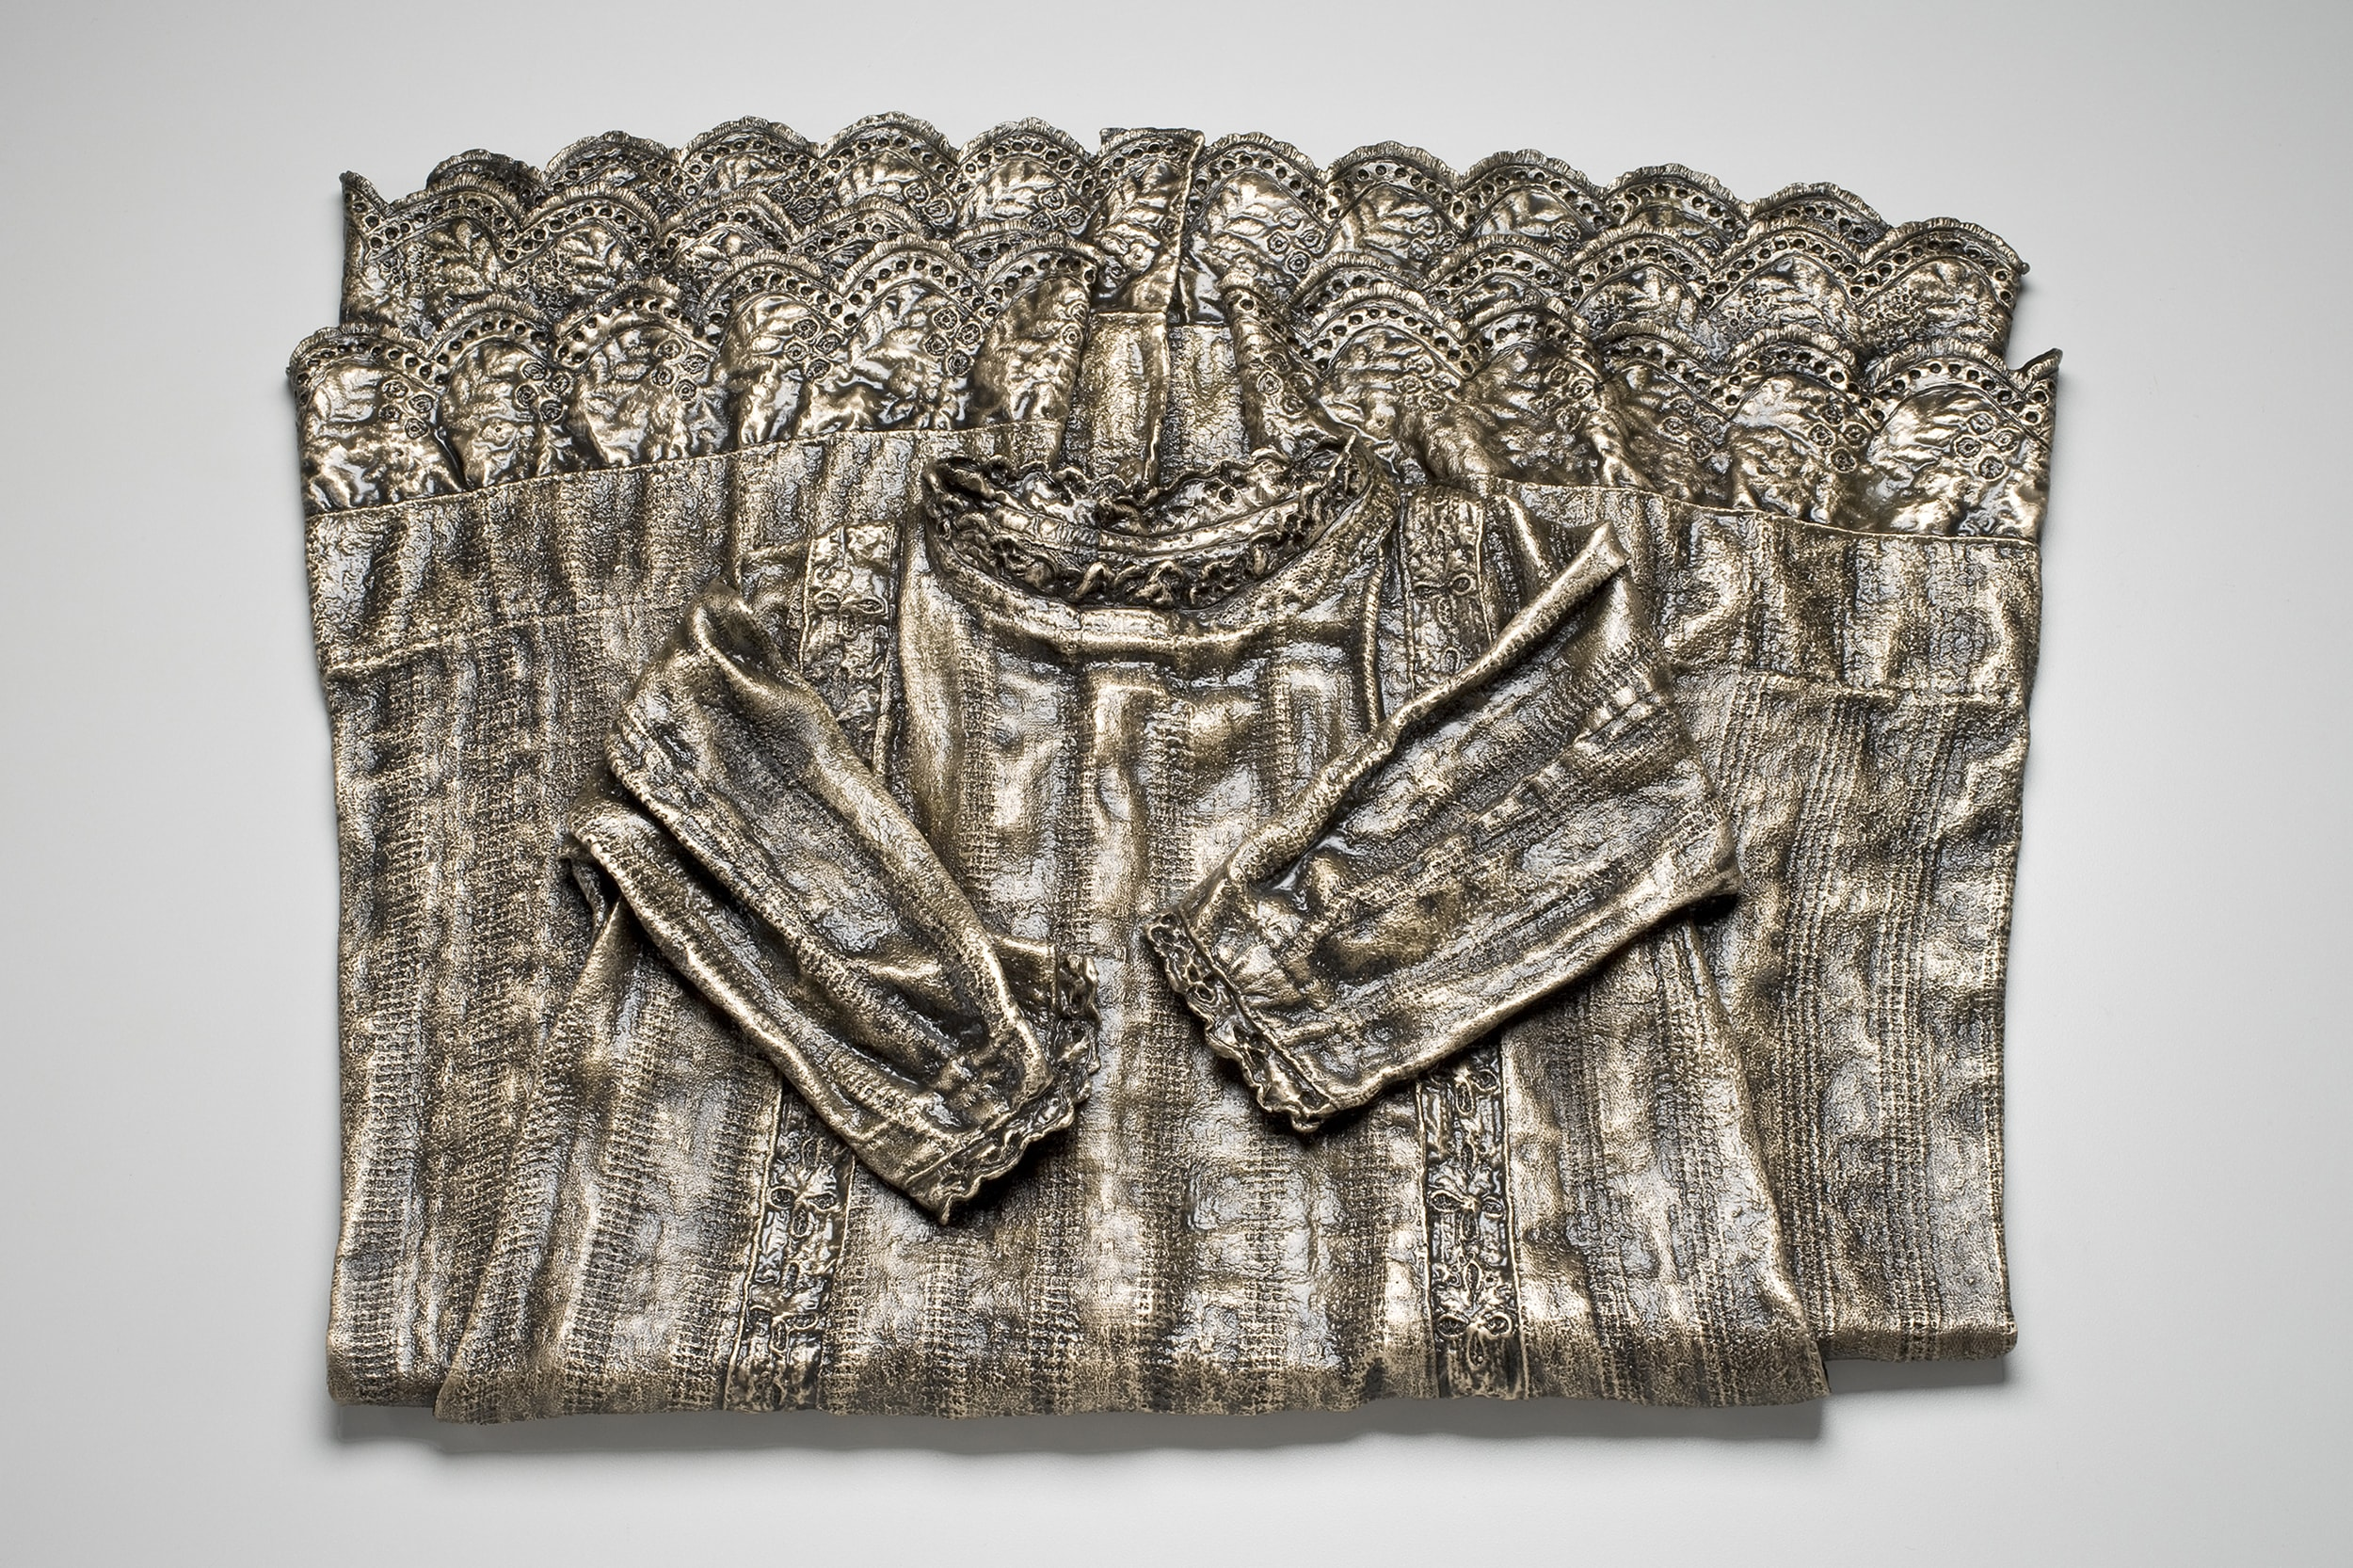 First Generation Artifact: Christening Gown